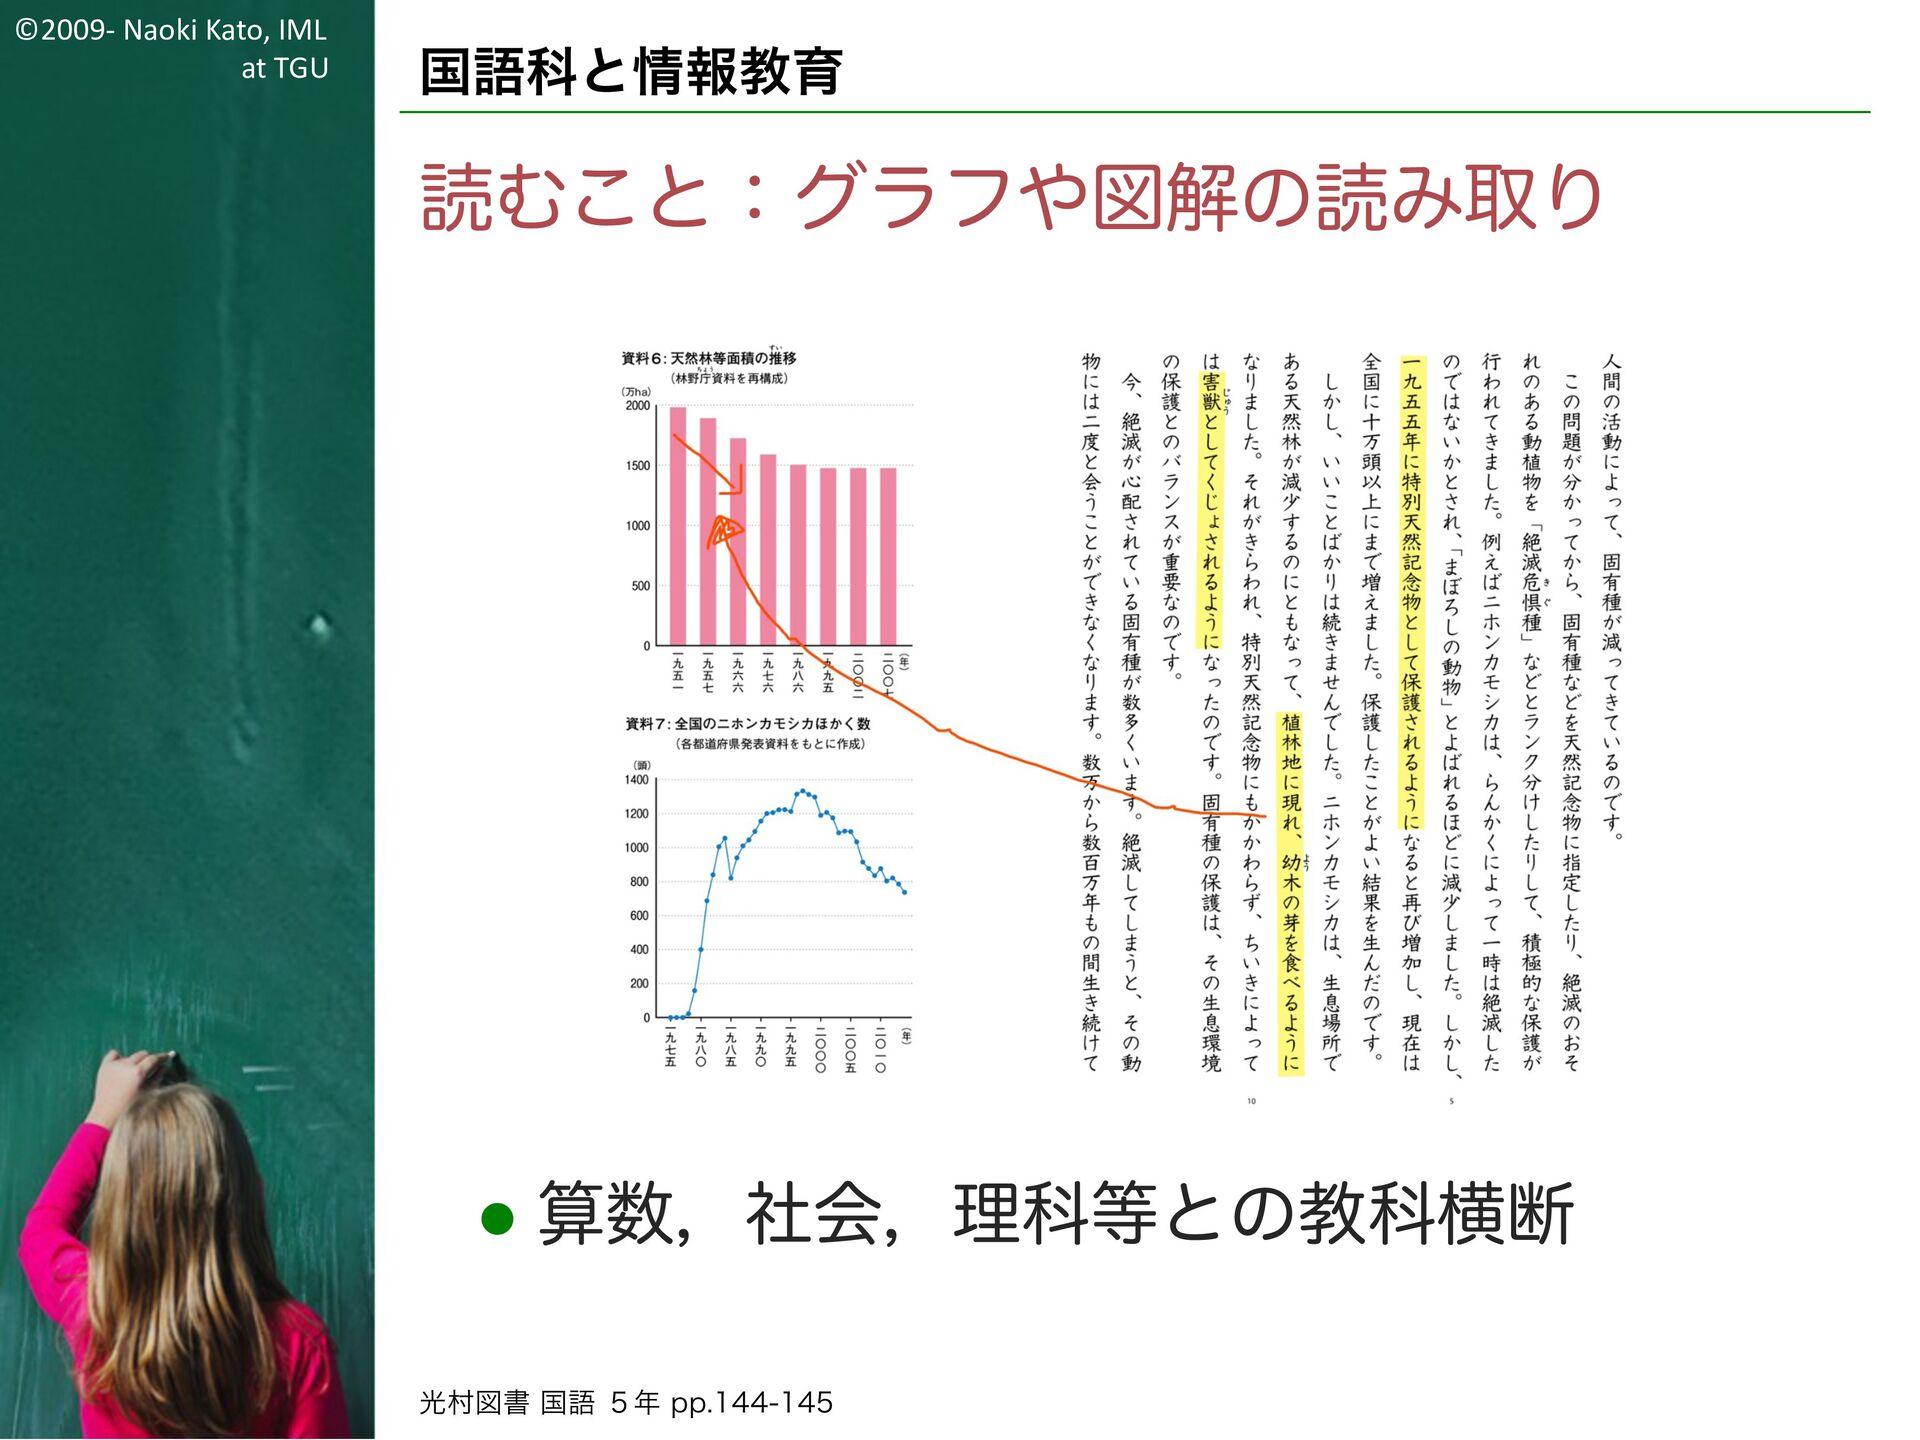 ©2009- Naoki Kato, IML at TGU 新学習指導要領へ 各教科での情報活...